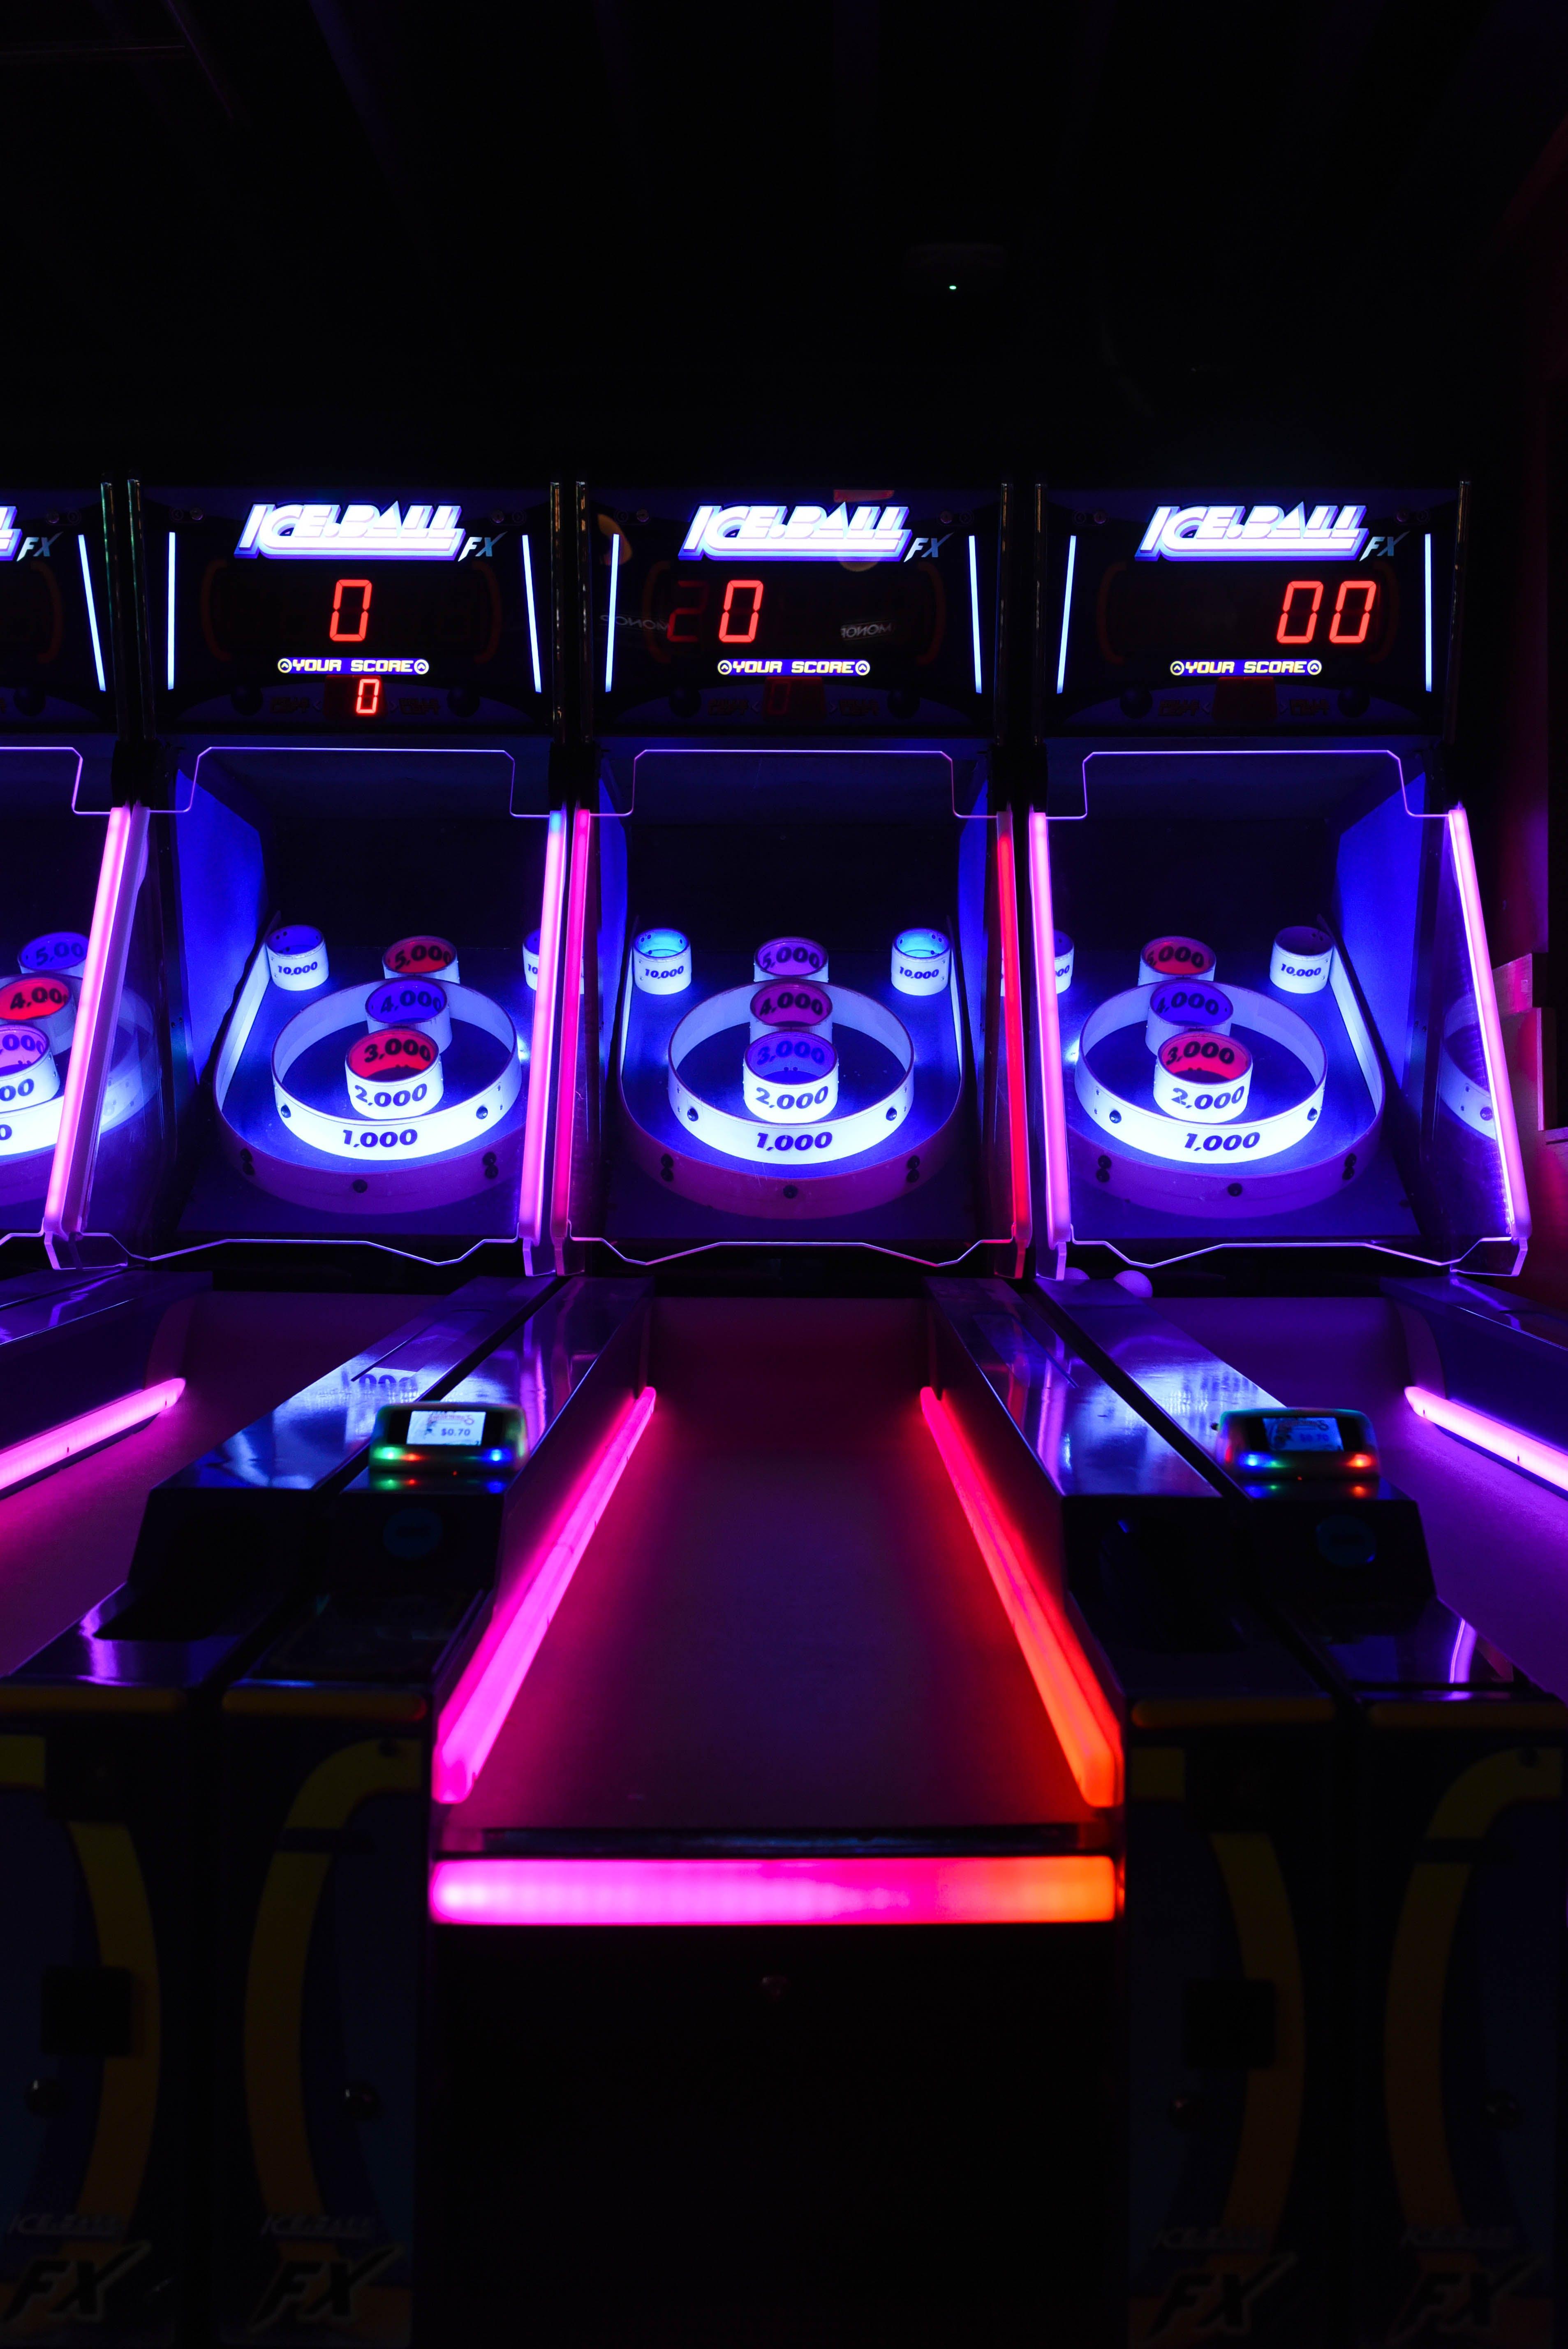 Led Lighted Bowling Arcade Machine